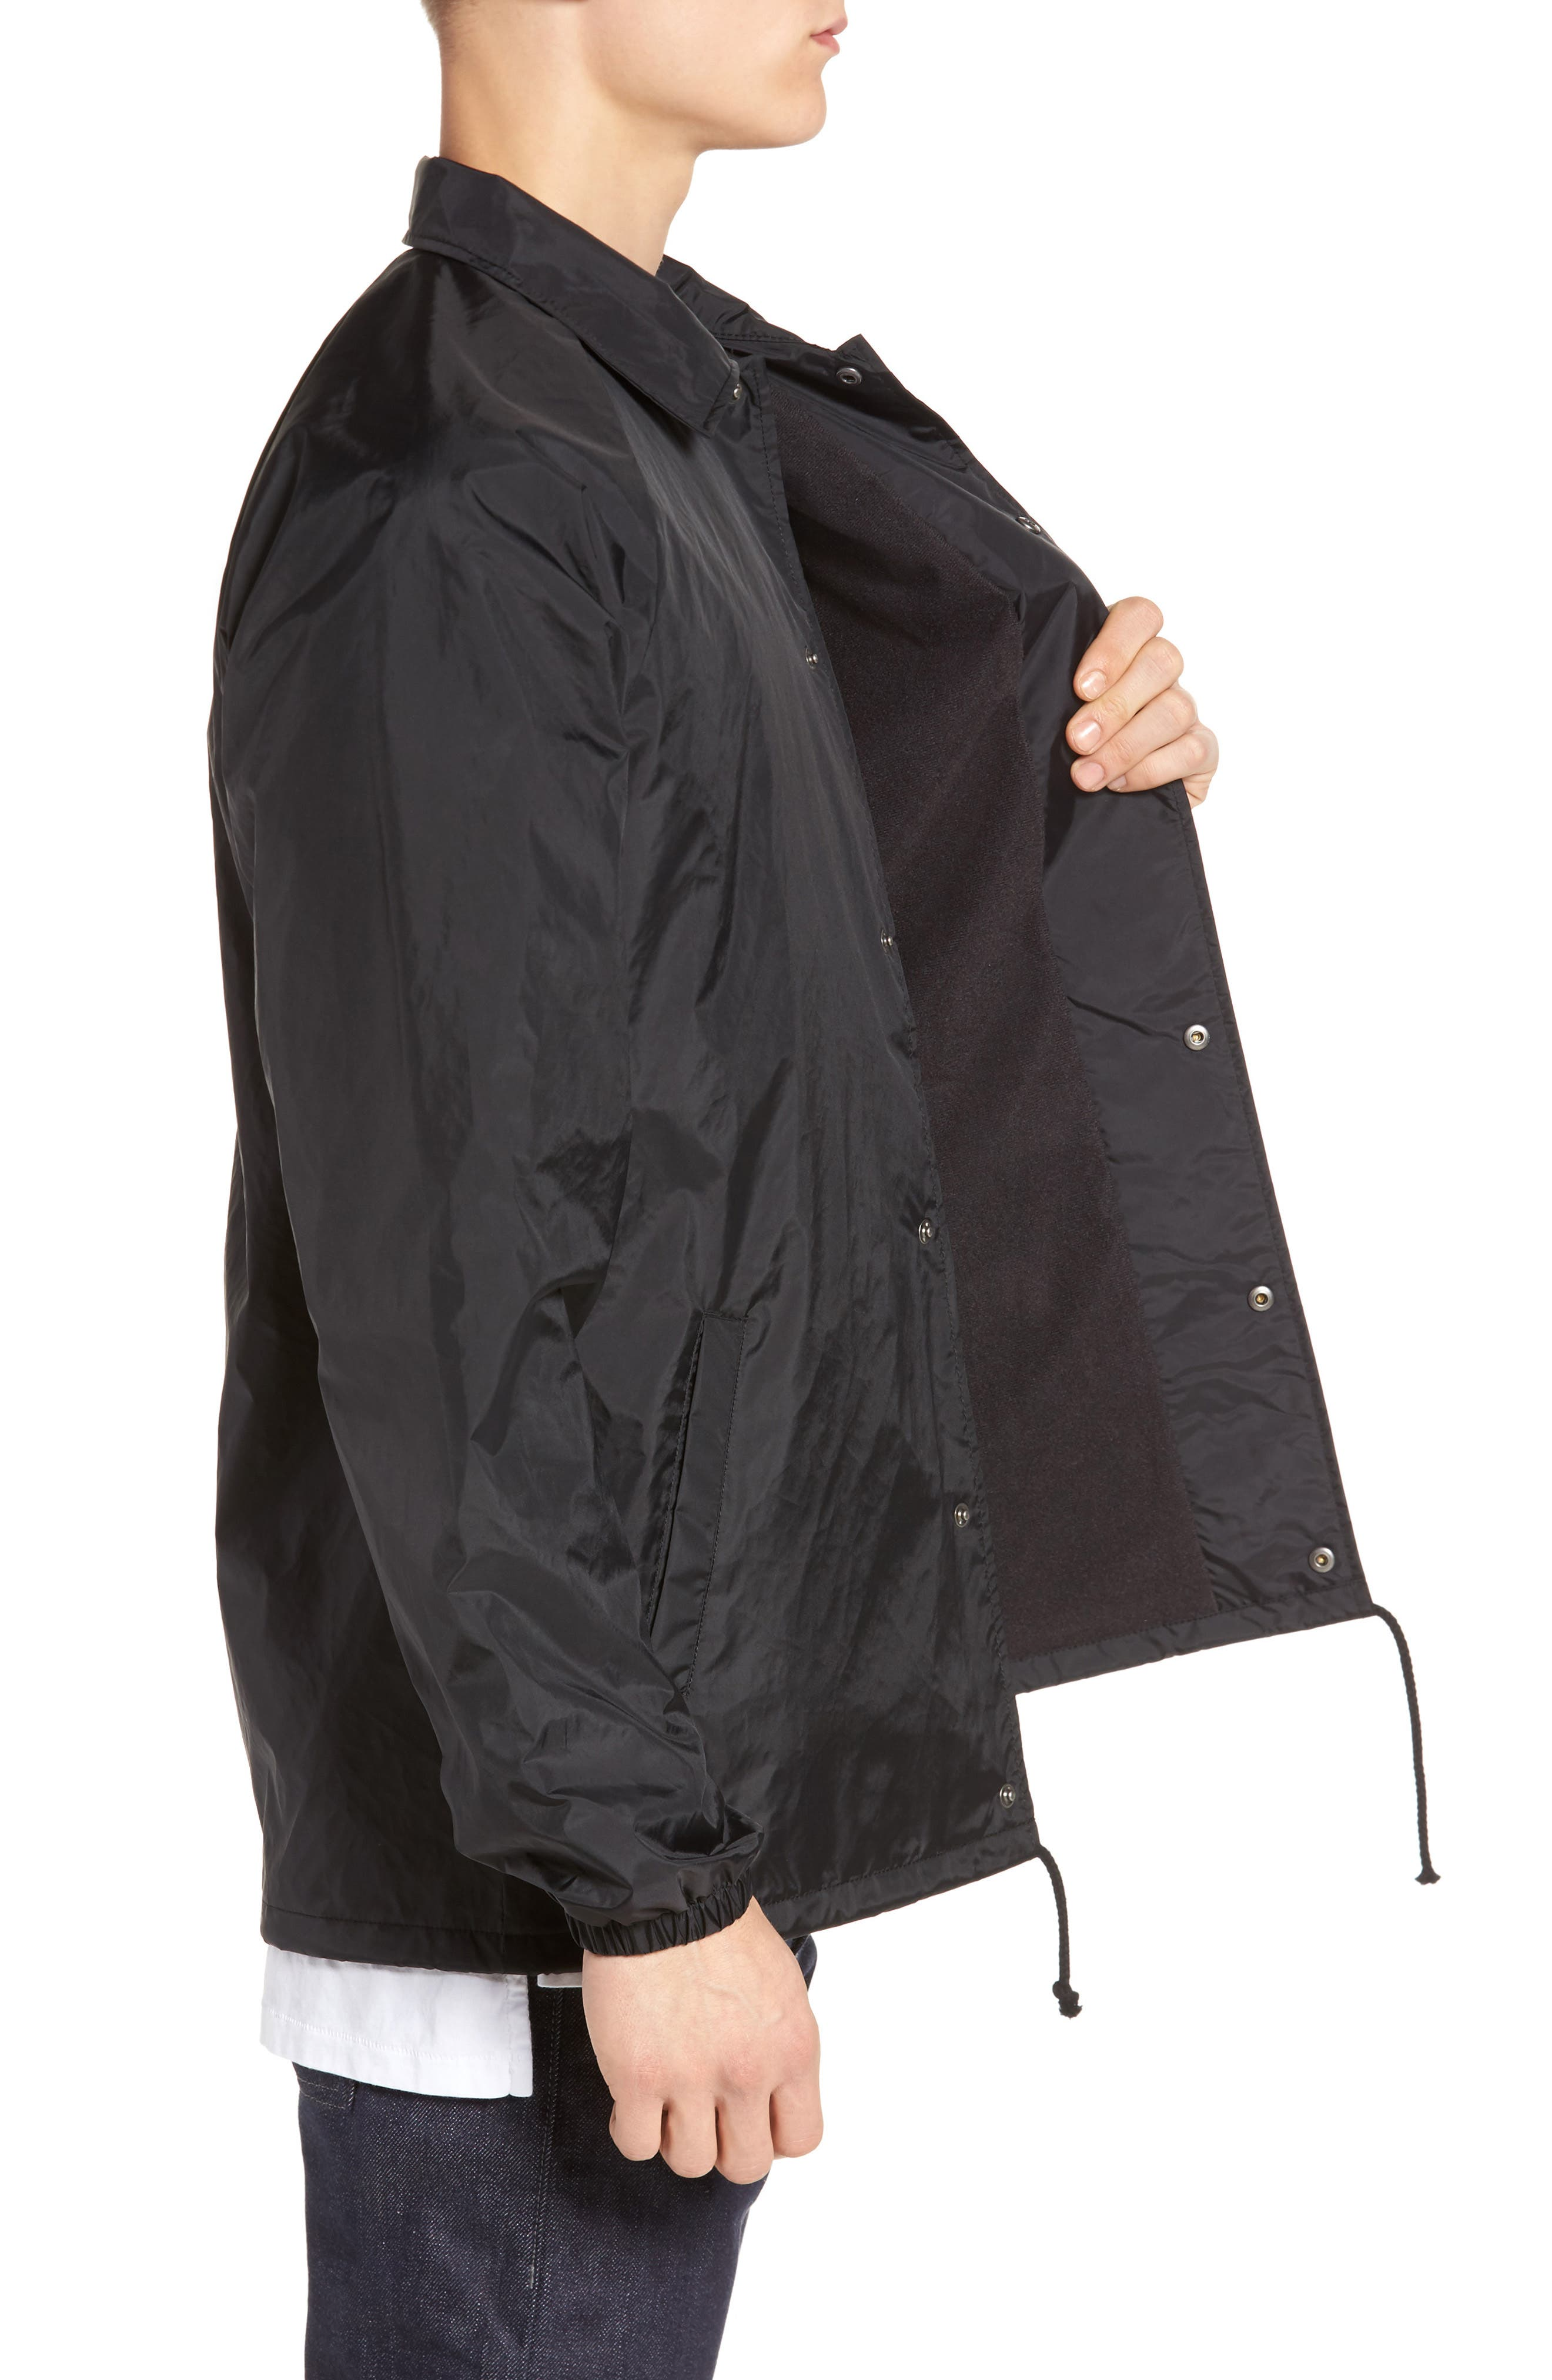 Torrey Water Resistant Jacket,                             Alternate thumbnail 3, color,                             BLACK/ WHITE